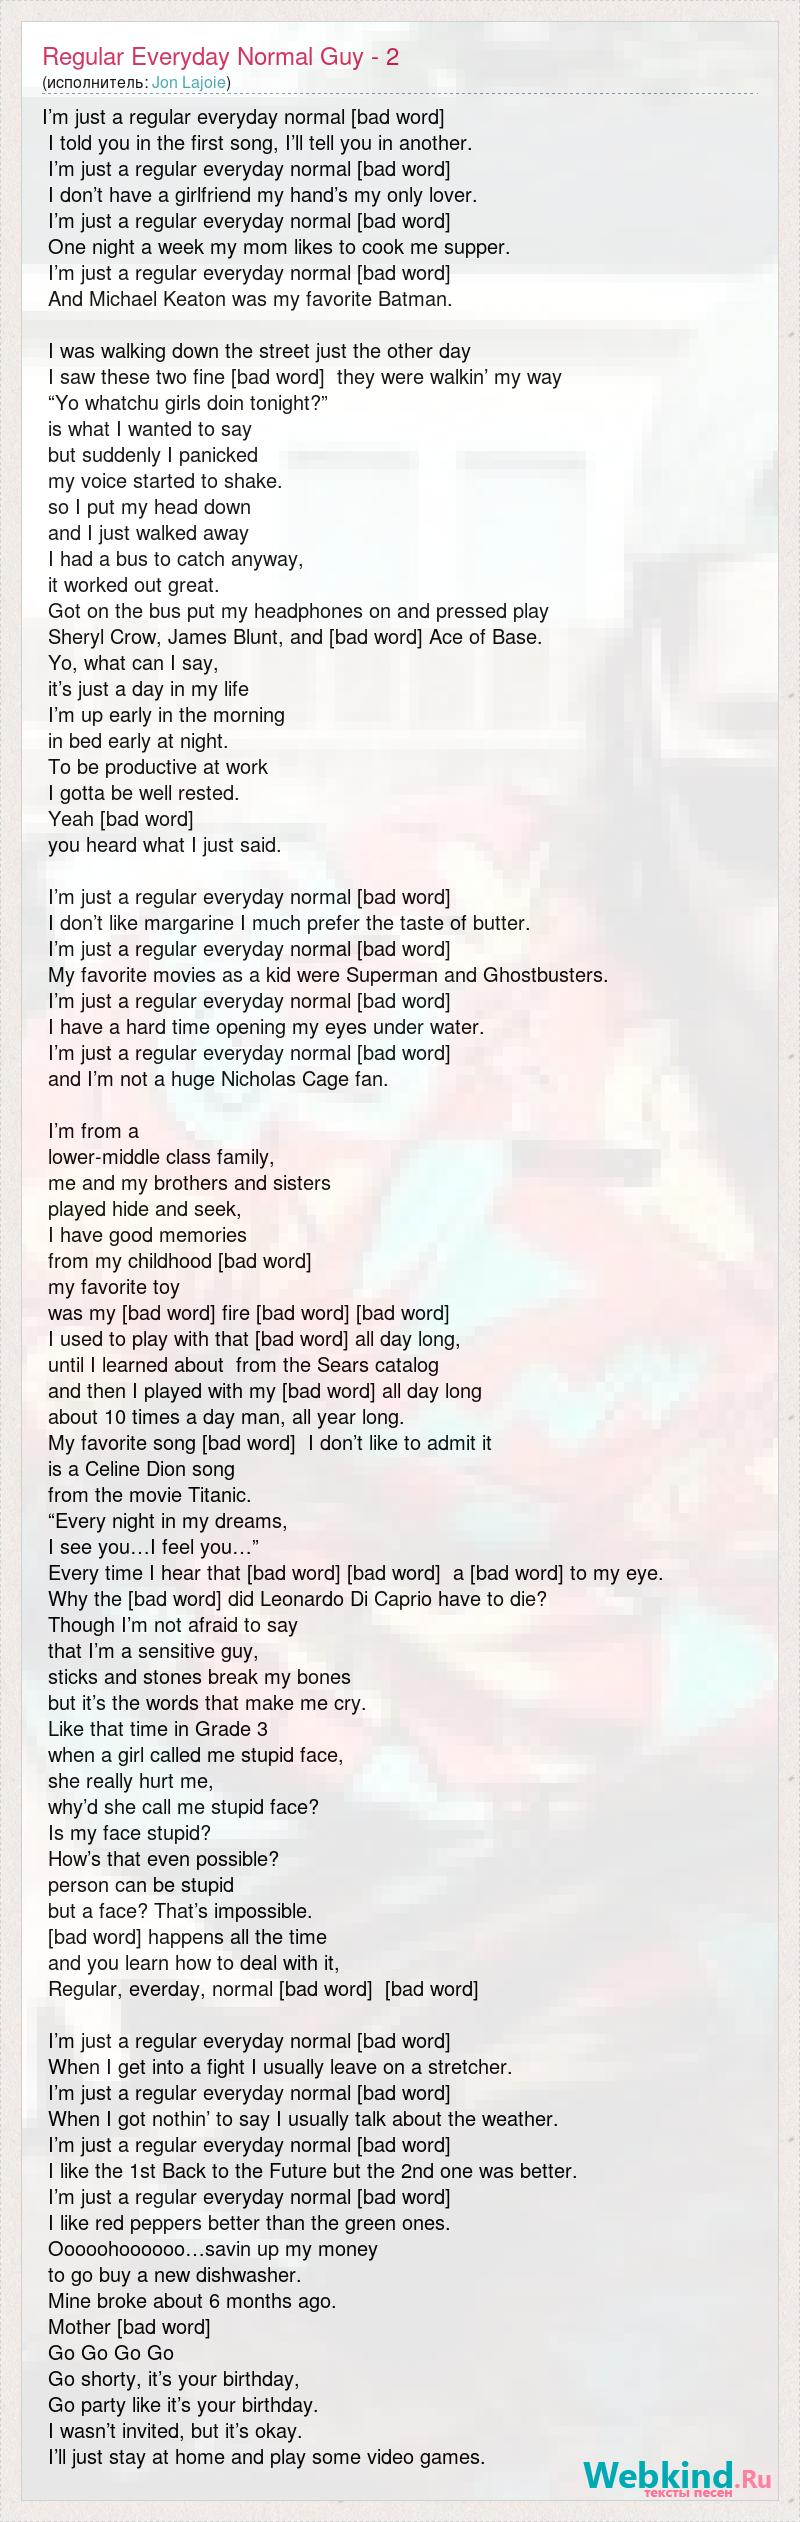 Jon Lajoie: Regular Everyday Normal Guy - 2 слова песни